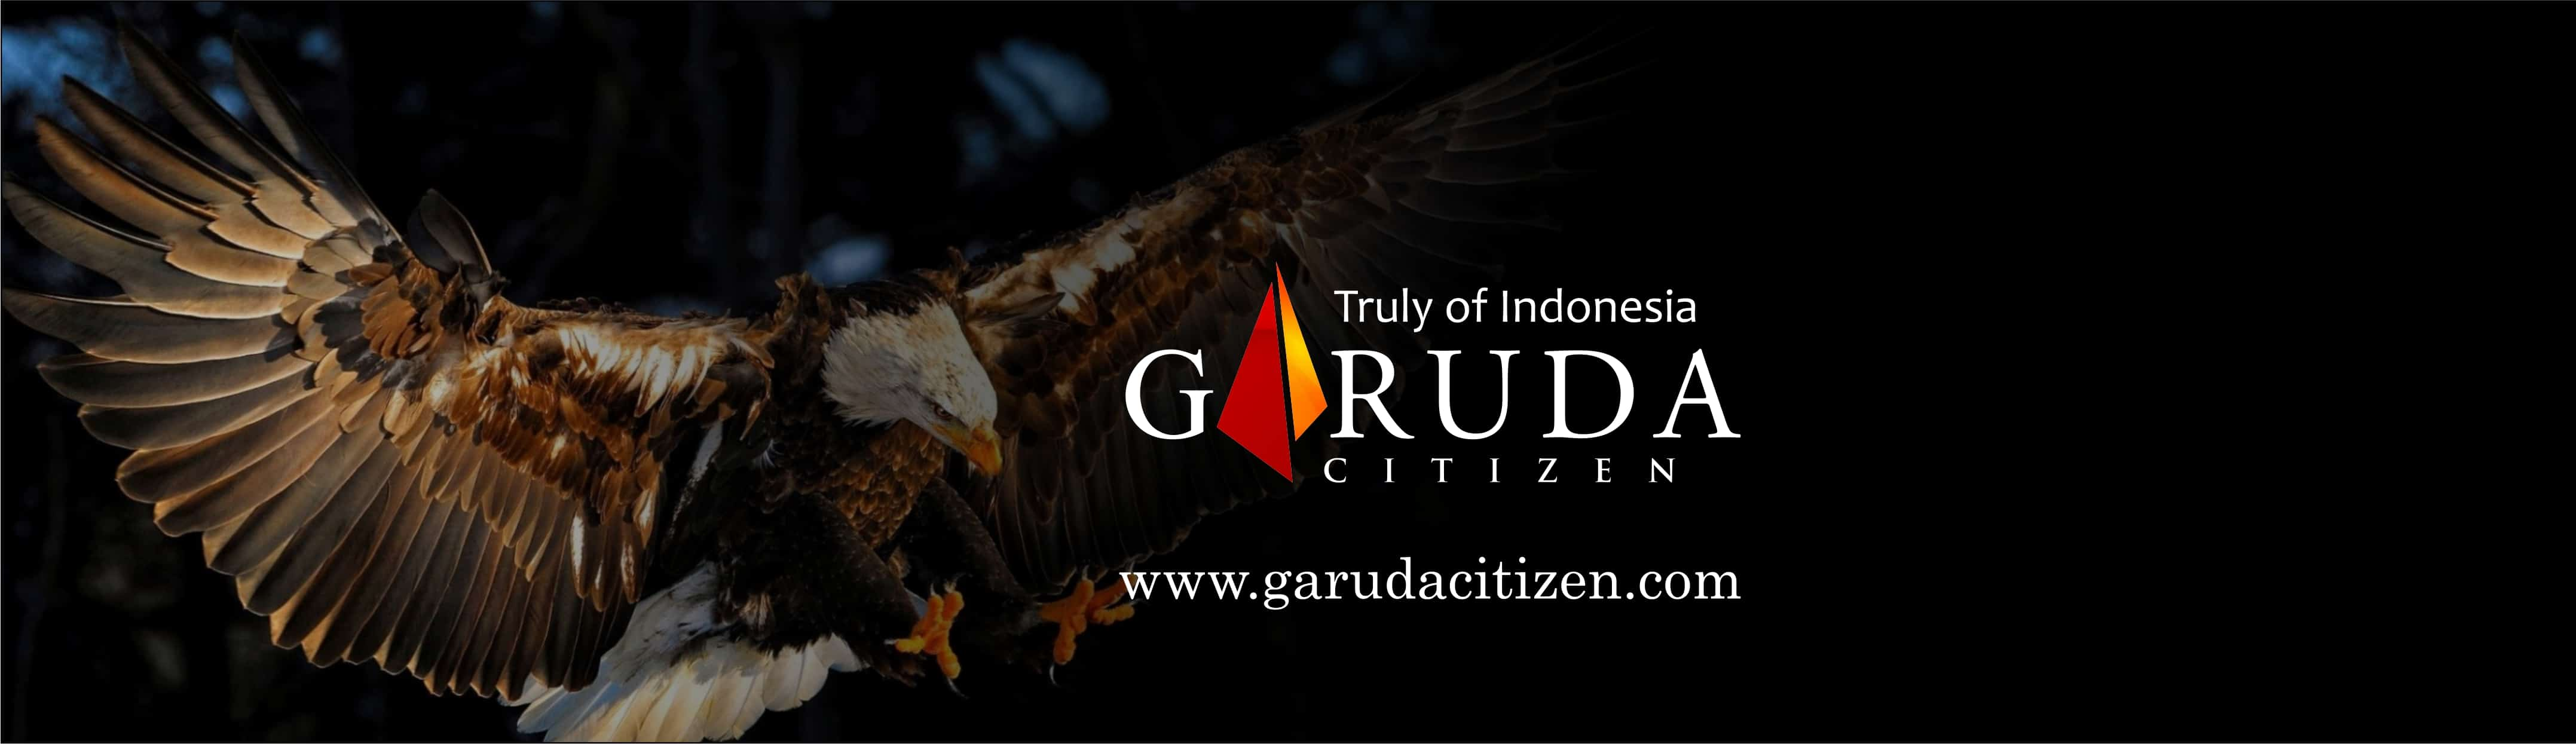 wallapepr twitter - Garuda Citizen